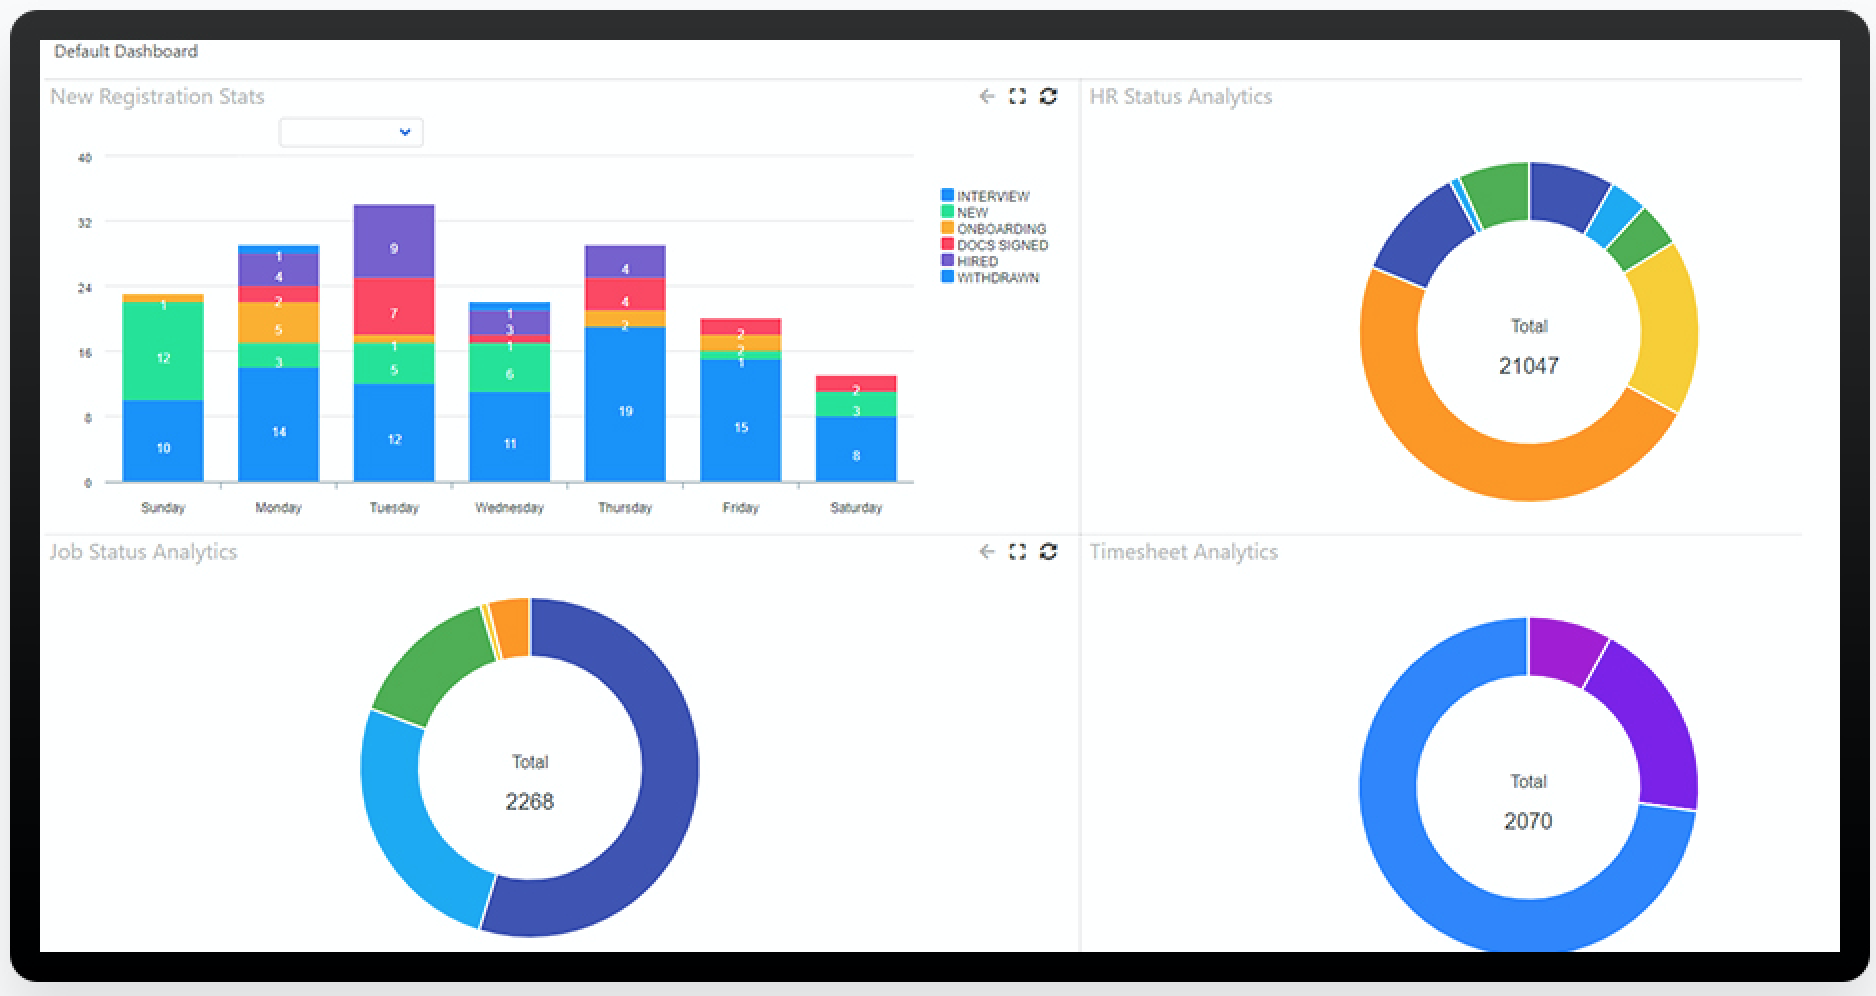 NextCrew analytics